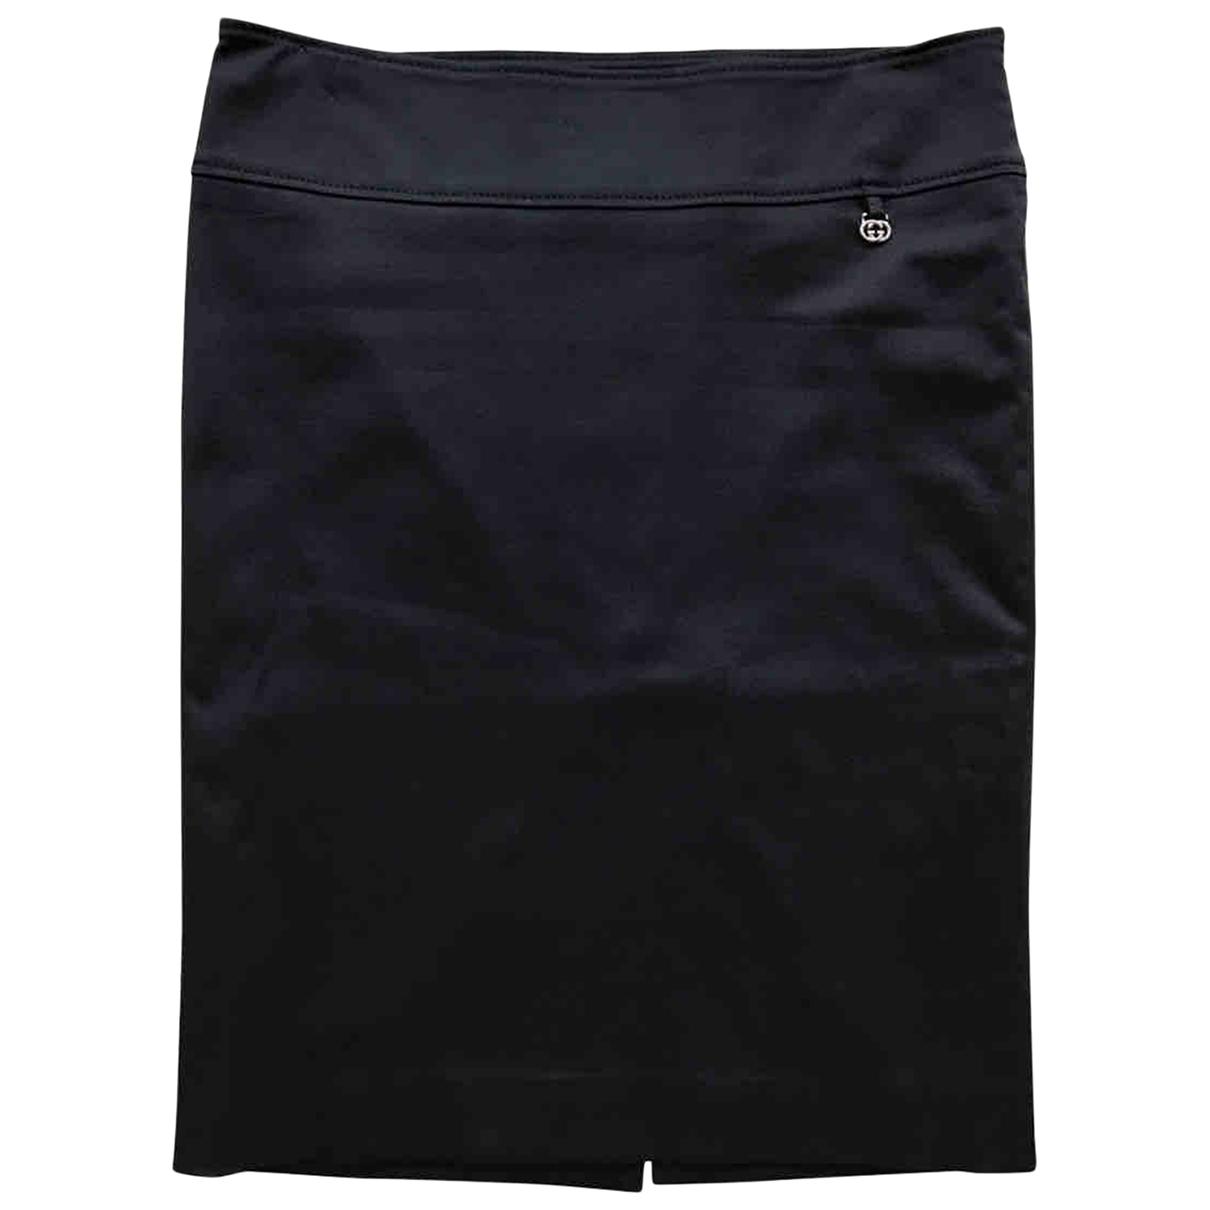 Gucci \N Black Cotton skirt for Women 38 IT